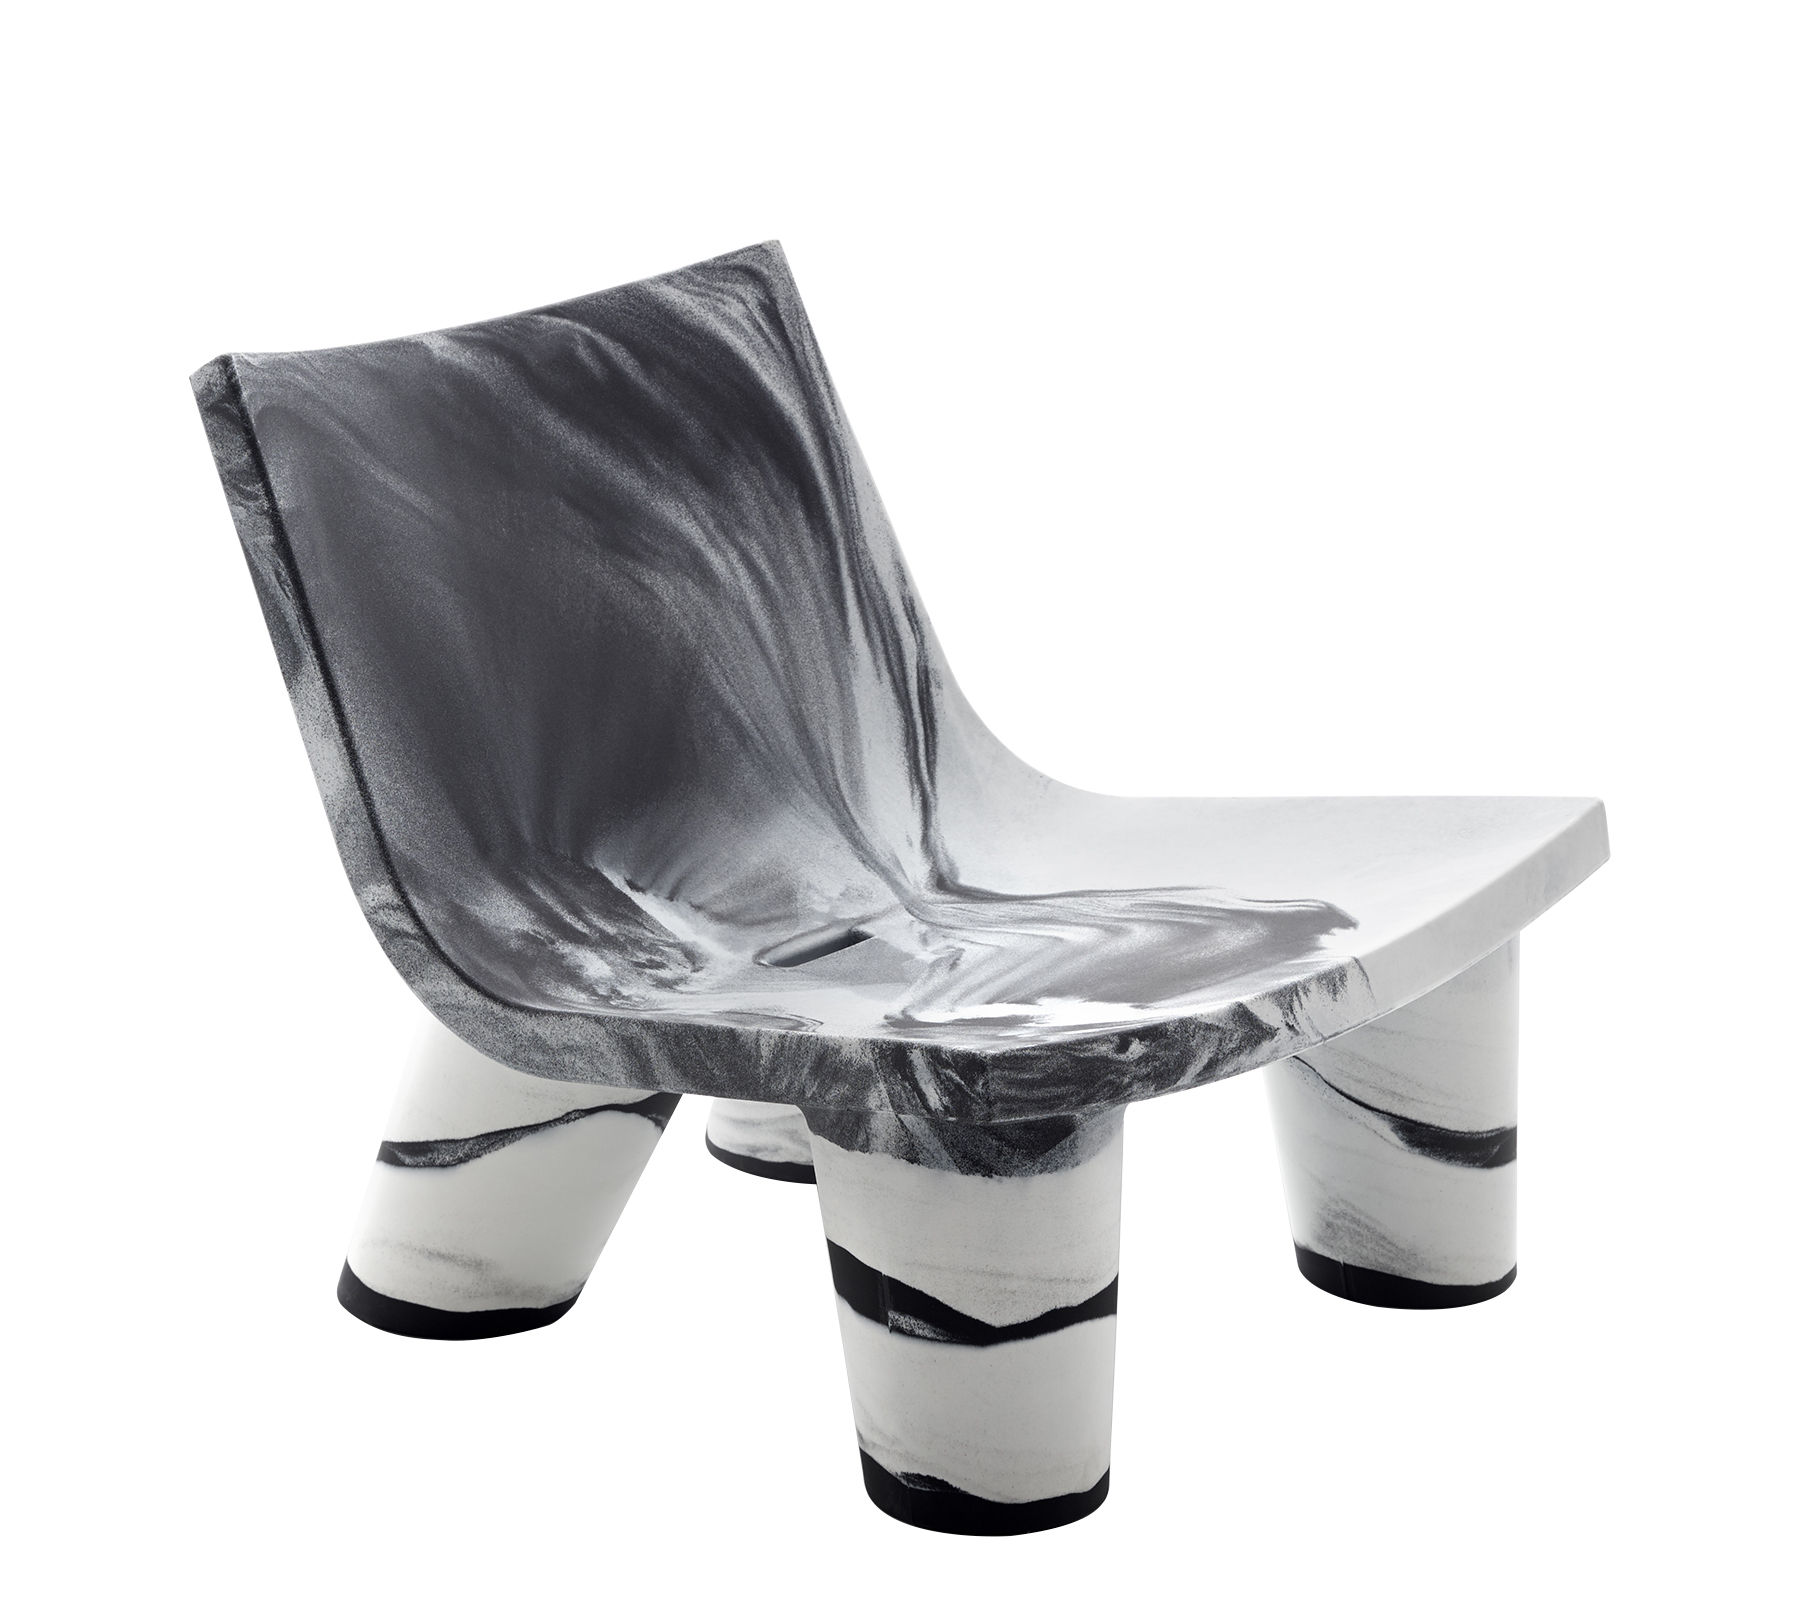 Möbel - Lounge Sessel - Low Lita Lounge Sessel / 10-Jahre-Jubiläumsedition, limitiert - Slide - Schwarz & weiß - polyéthène recyclable